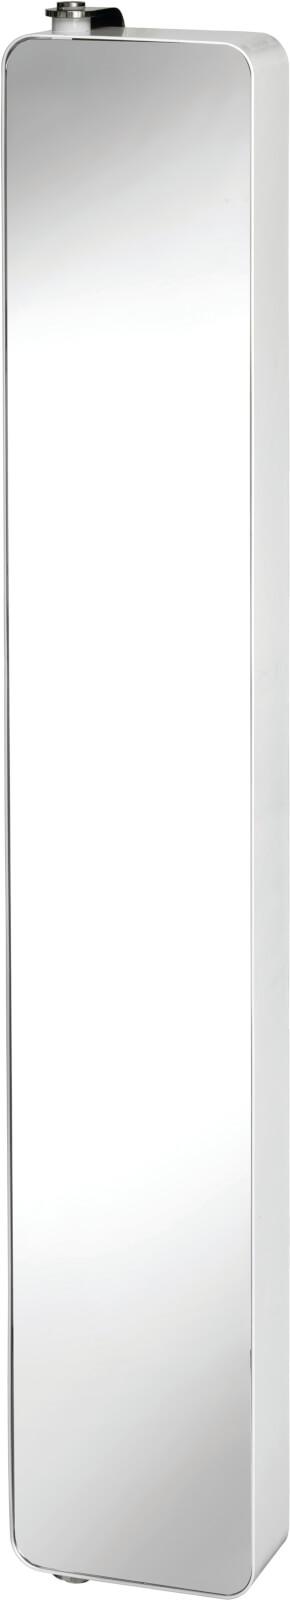 An Image of Croydex Arun Tall Bathroom Cabinet with Pivoting Door